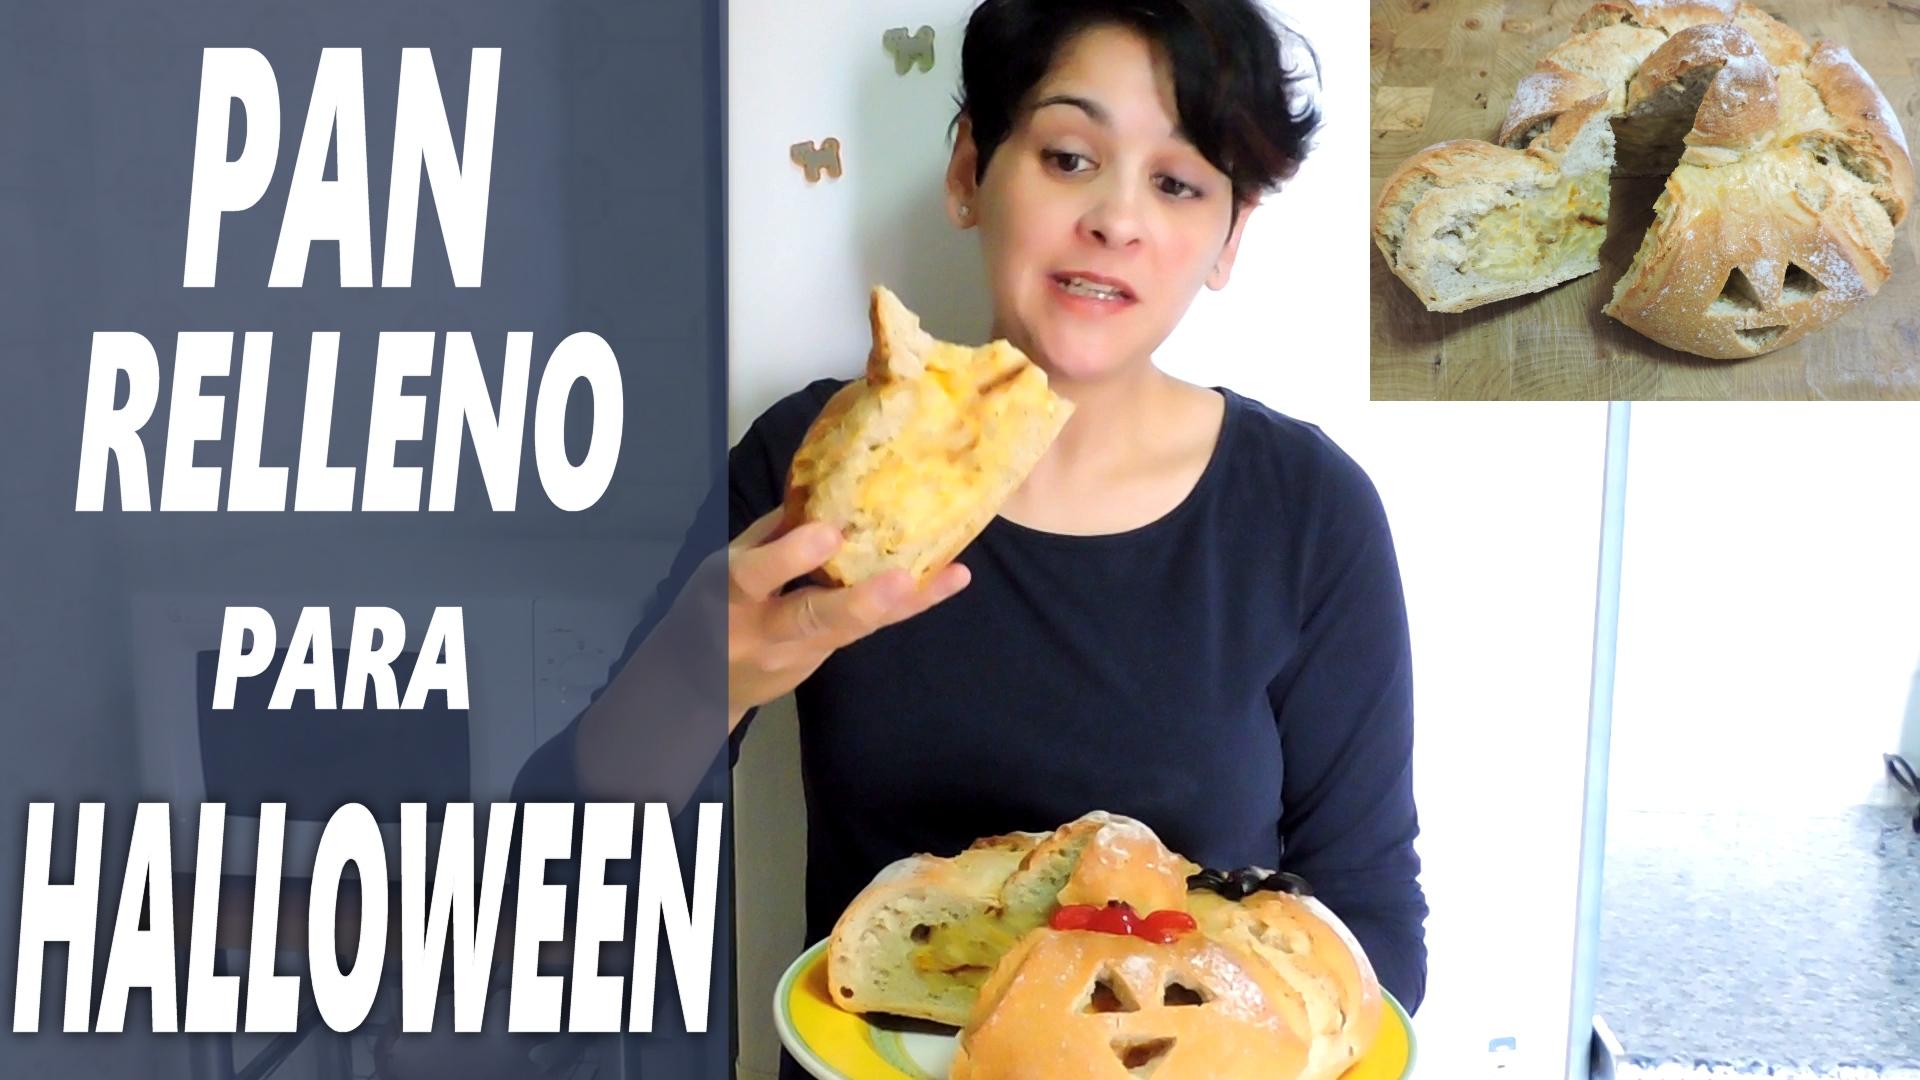 Pan relleno para Halloween